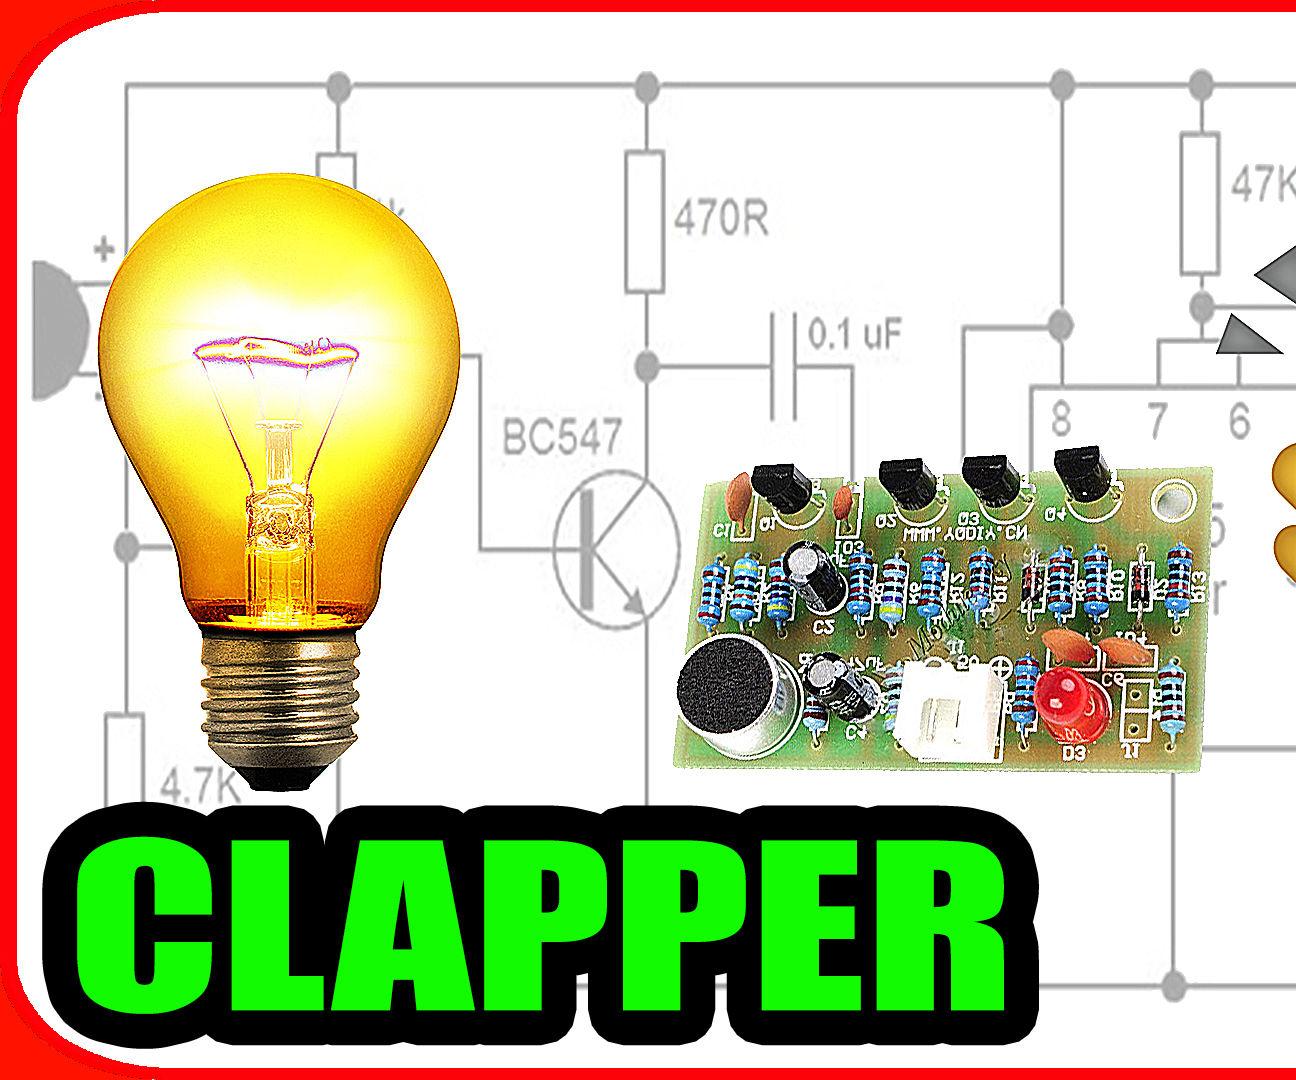 Let's Make a Clap Switch Circuit